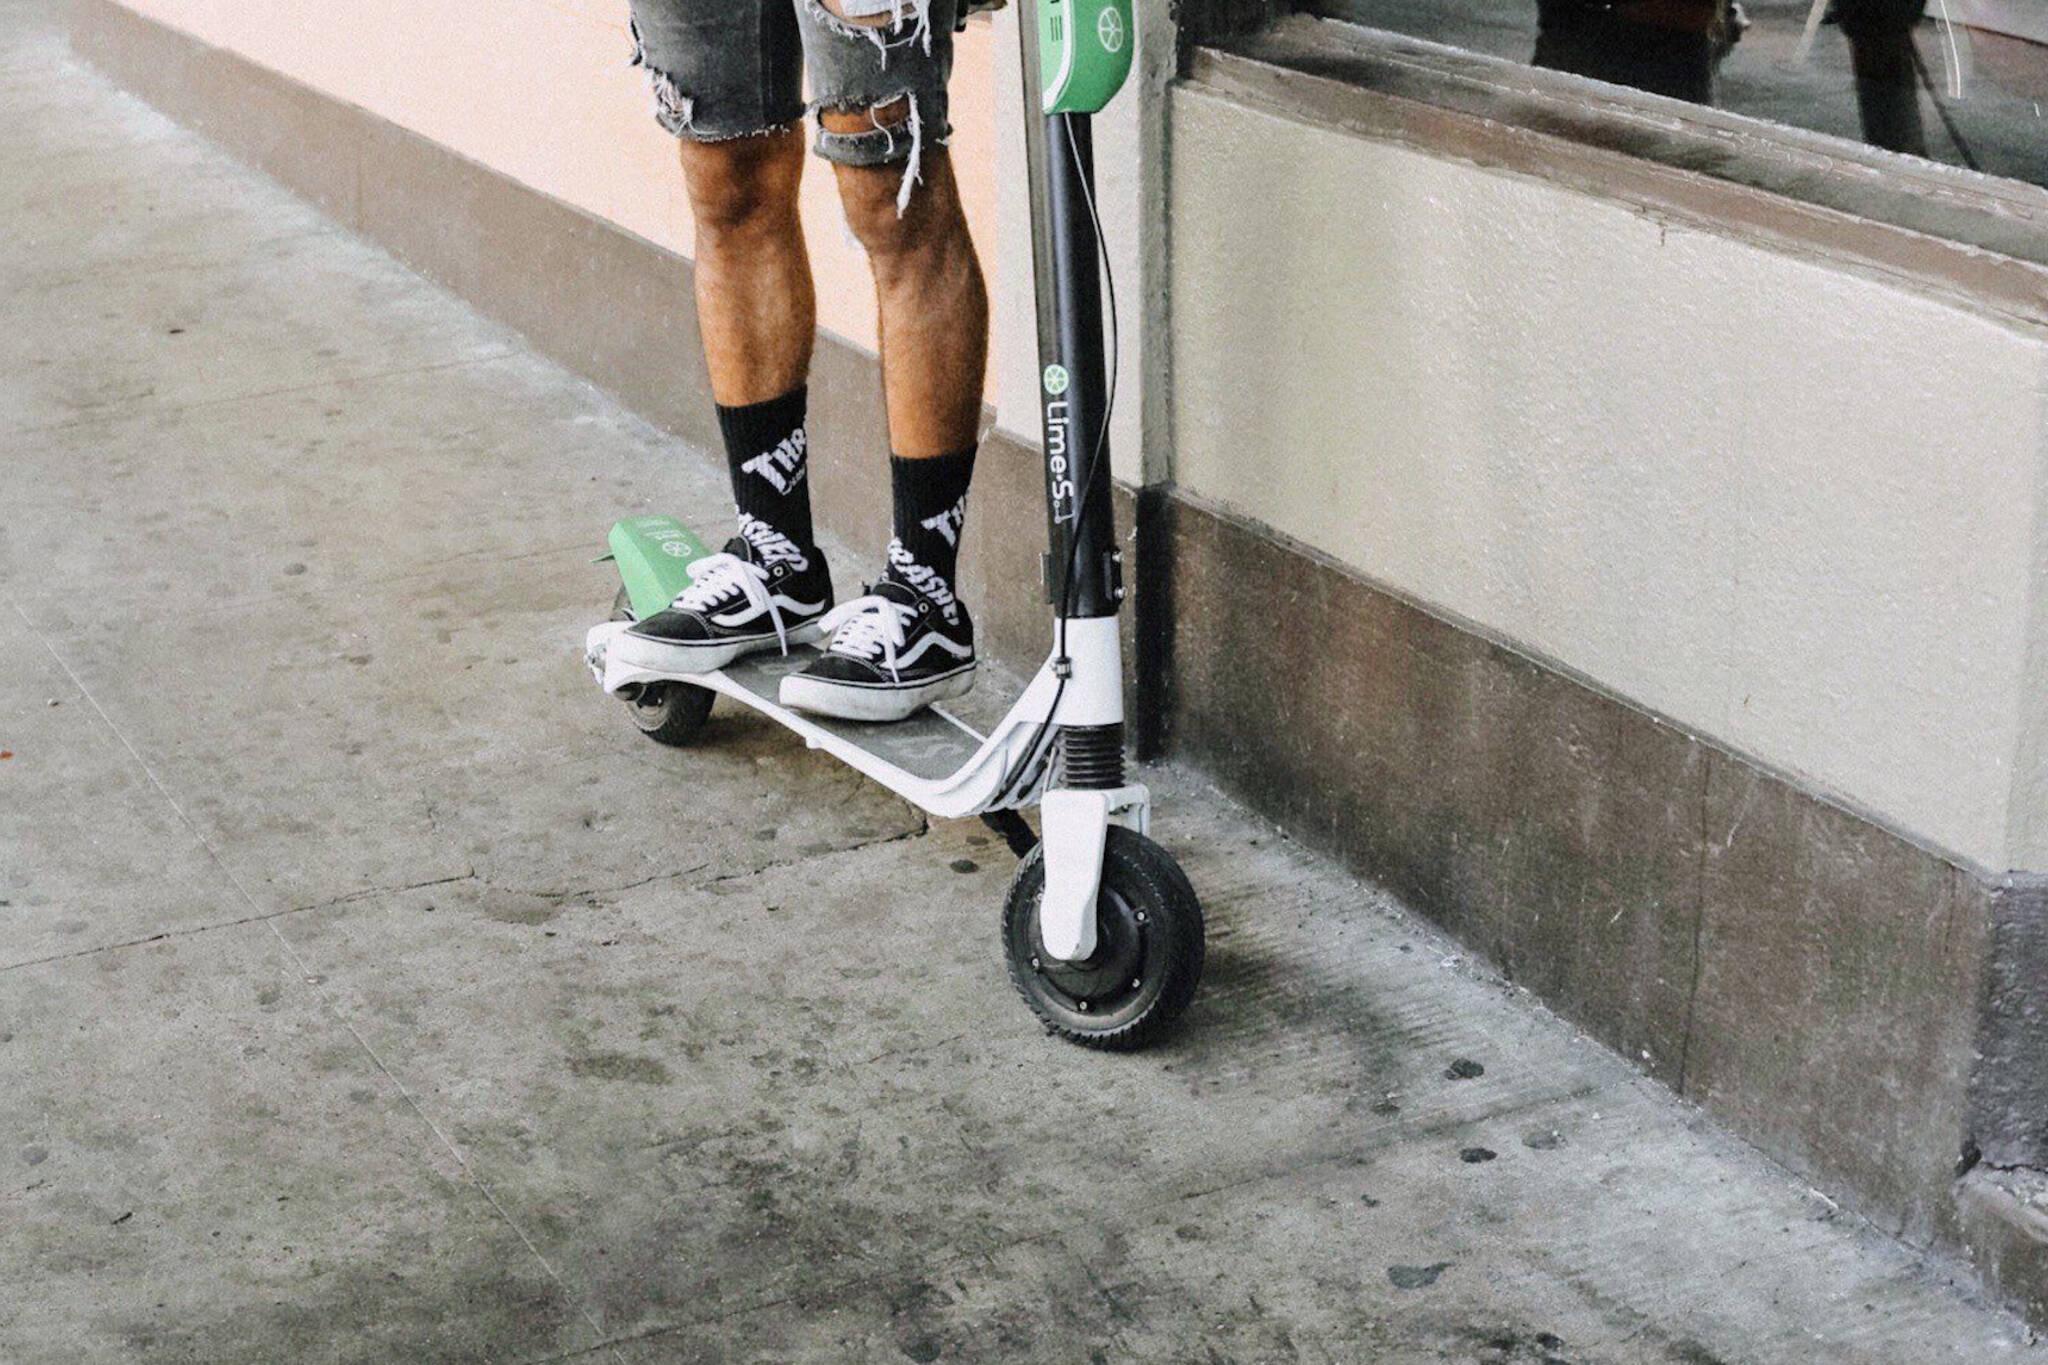 e scooter toronto